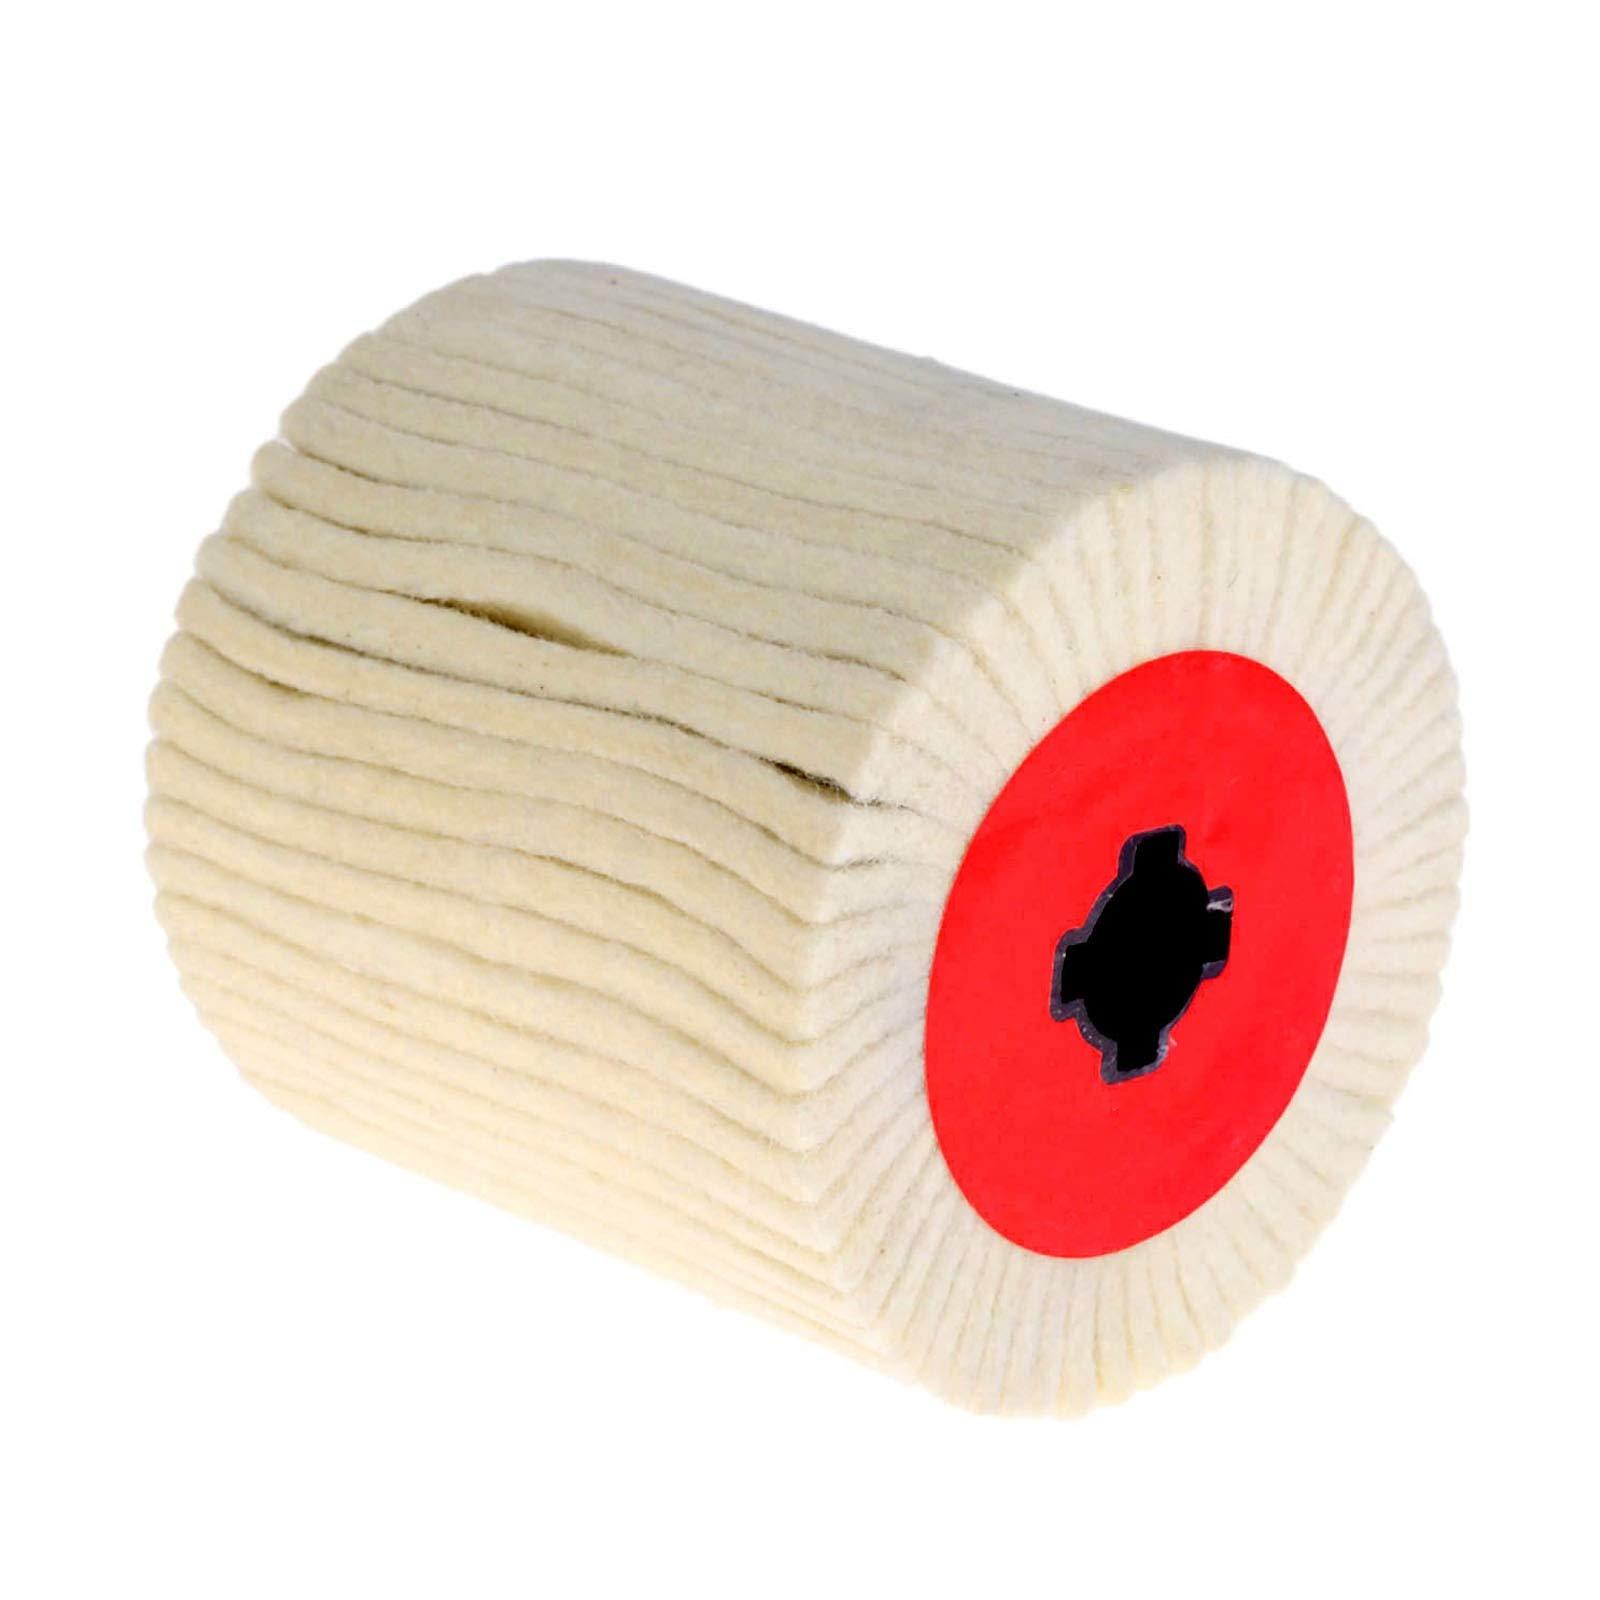 HeroStore 1Pc 100mm/120mm Abrasive Drum Wool Brush Polishing Grinding Buffing Striping Wheel for Electric Wire Drawing Machine